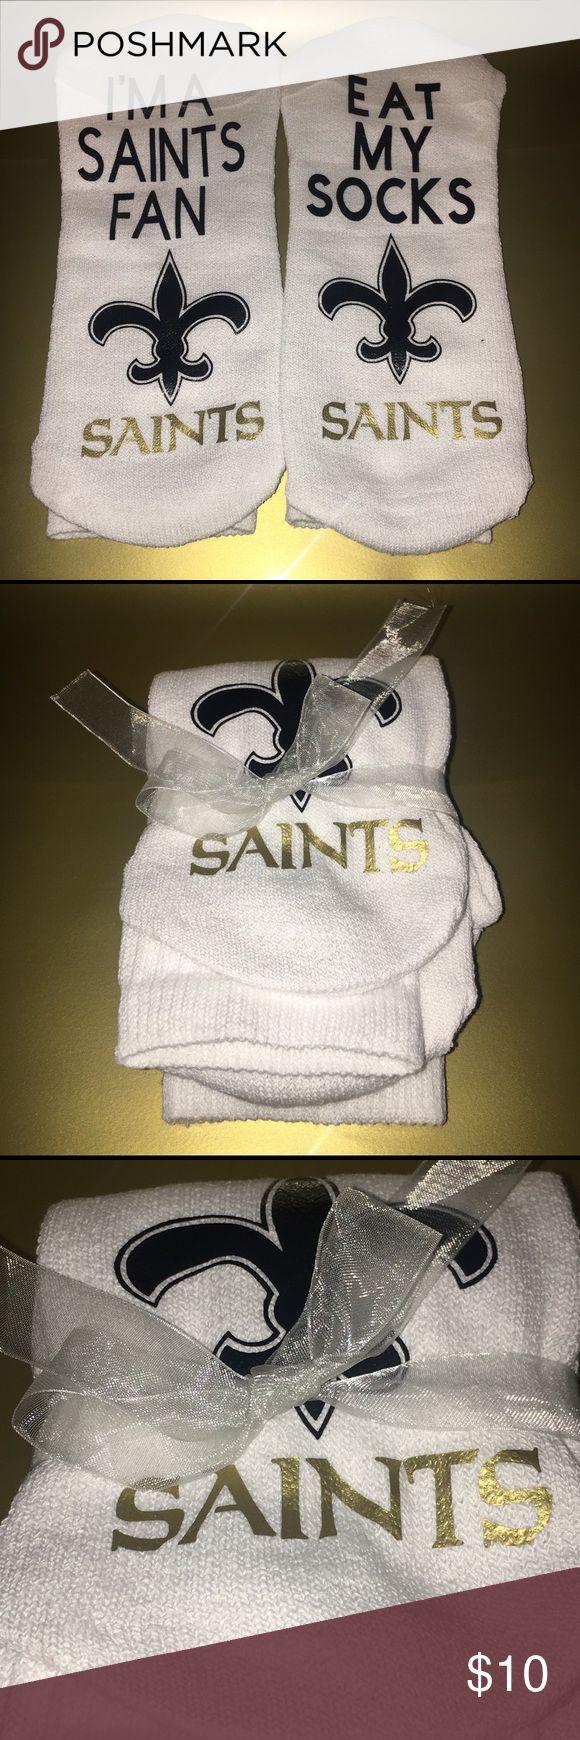 Men's Sports Tube socks Saints Men's Sports Tube socks Saints fits shoe size 6-11 Underwear & Socks Casual Socks